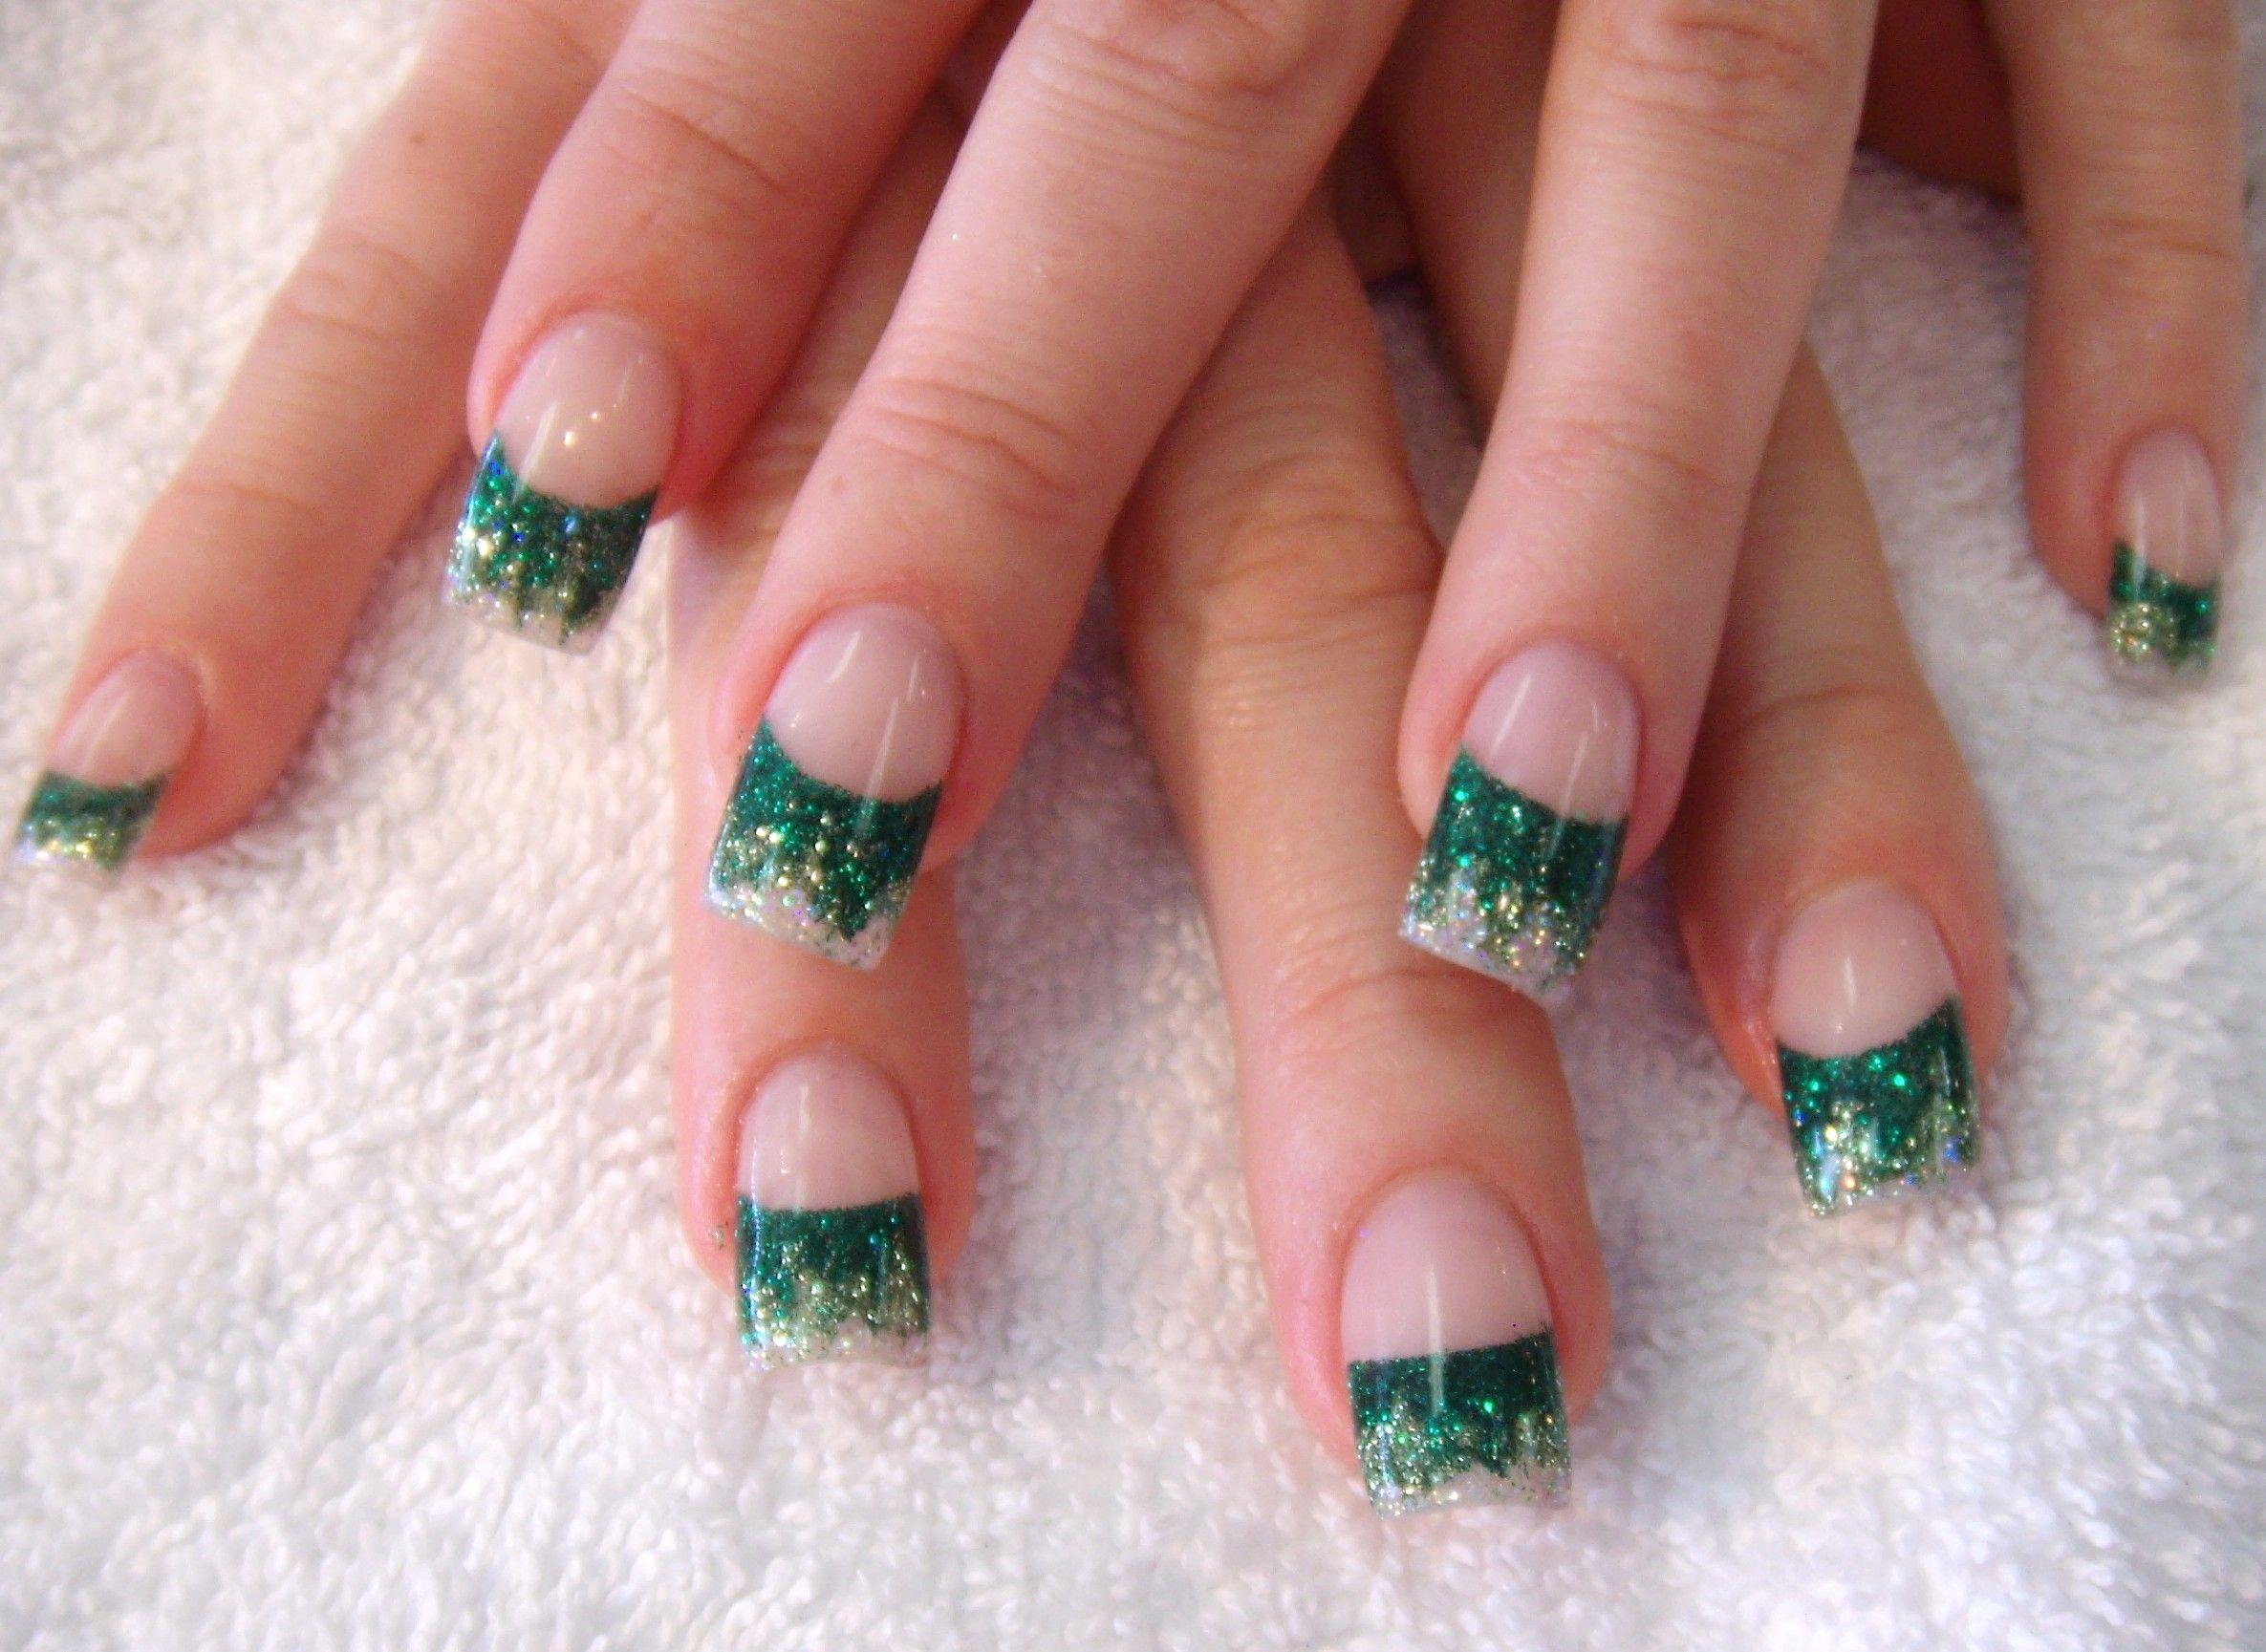 elegant nail art tips and tricks | nail art design gallery, green